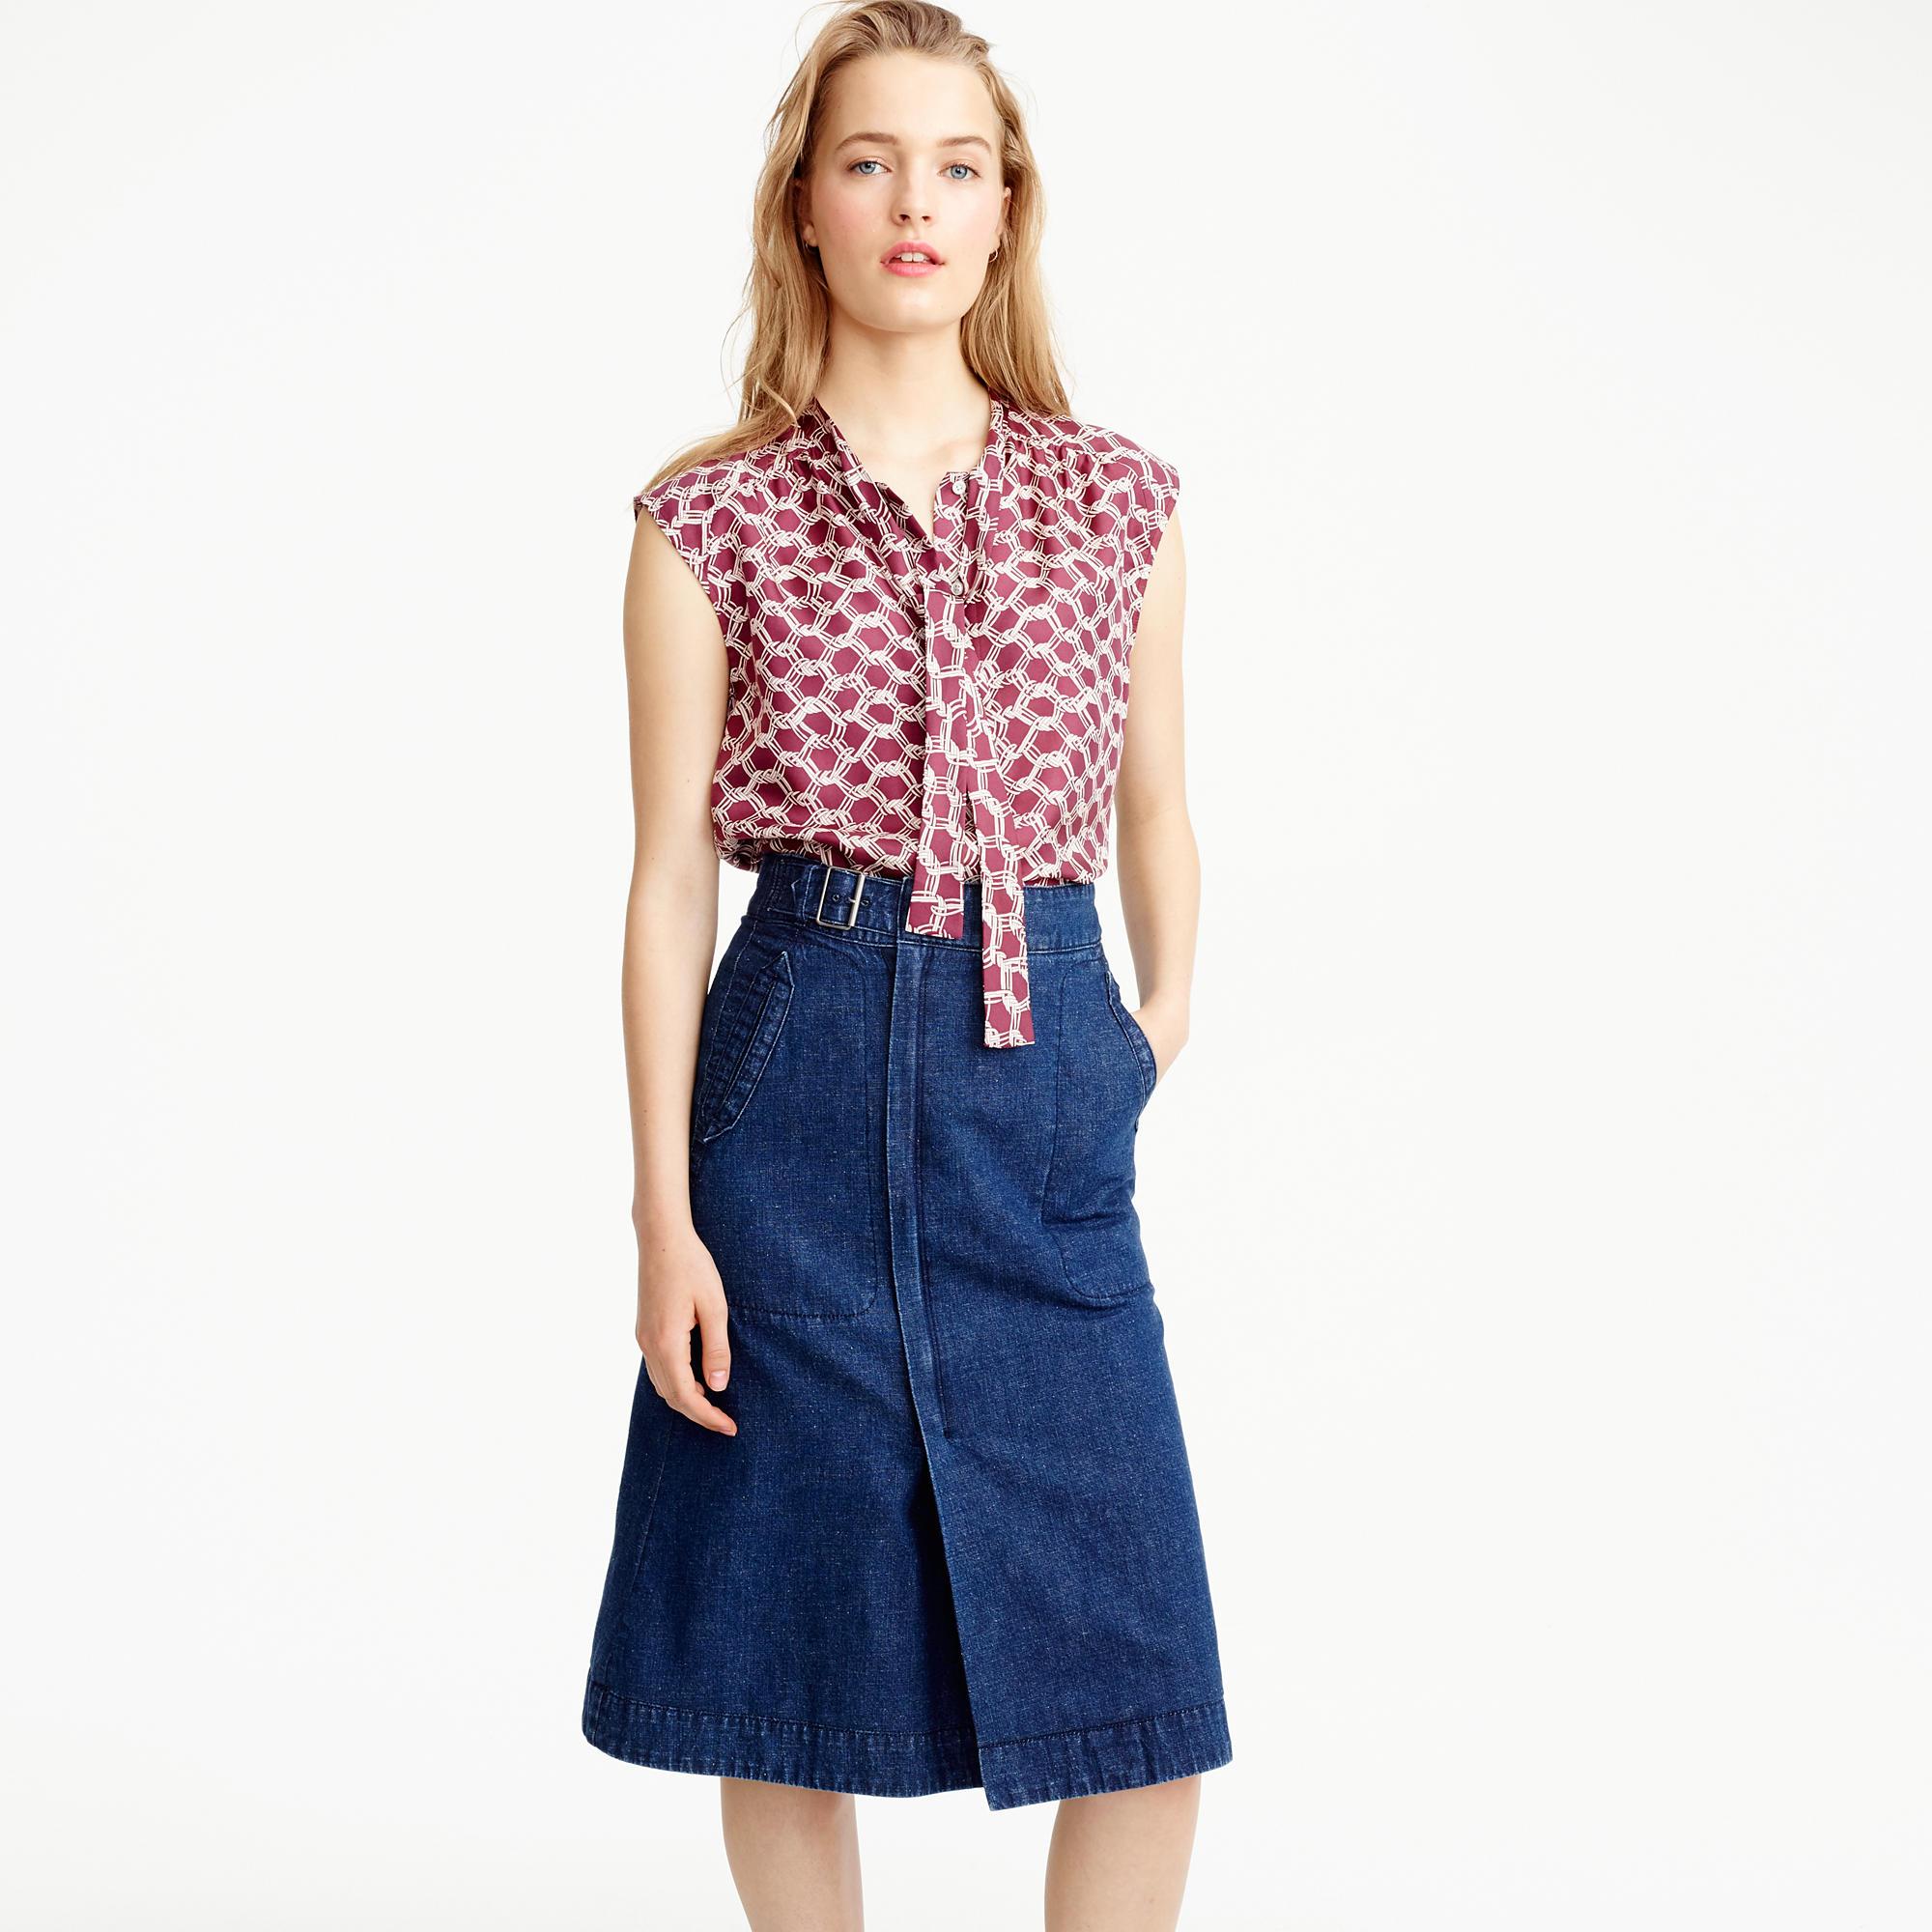 Belted A-line skirt in denim : Women denim | J.Crew